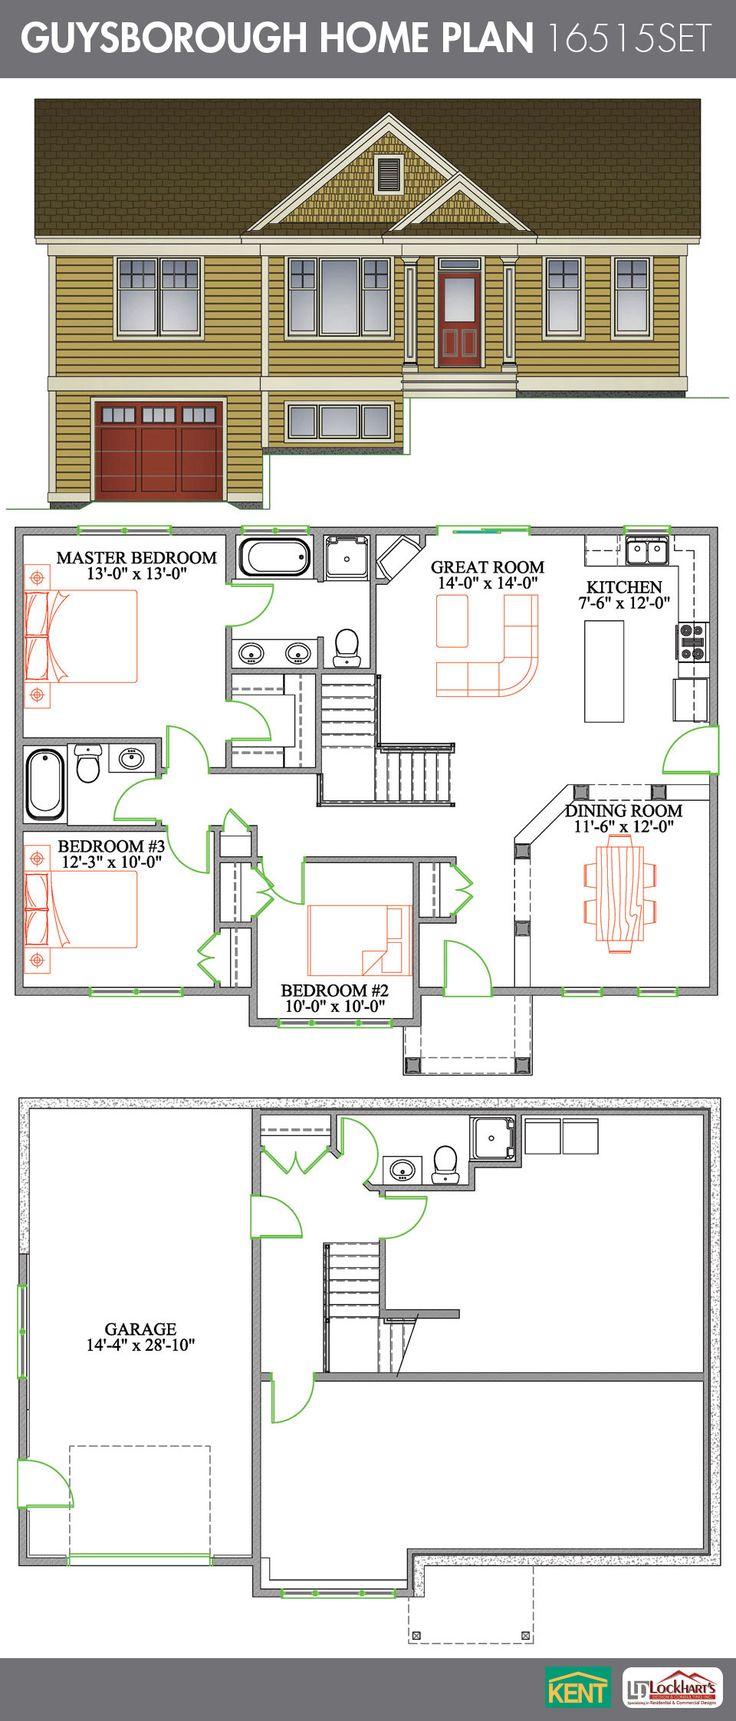 27 best bungalow home plans images on pinterest home builder guysborough 3 bedroom 3 bathroom home plan features open concept great room